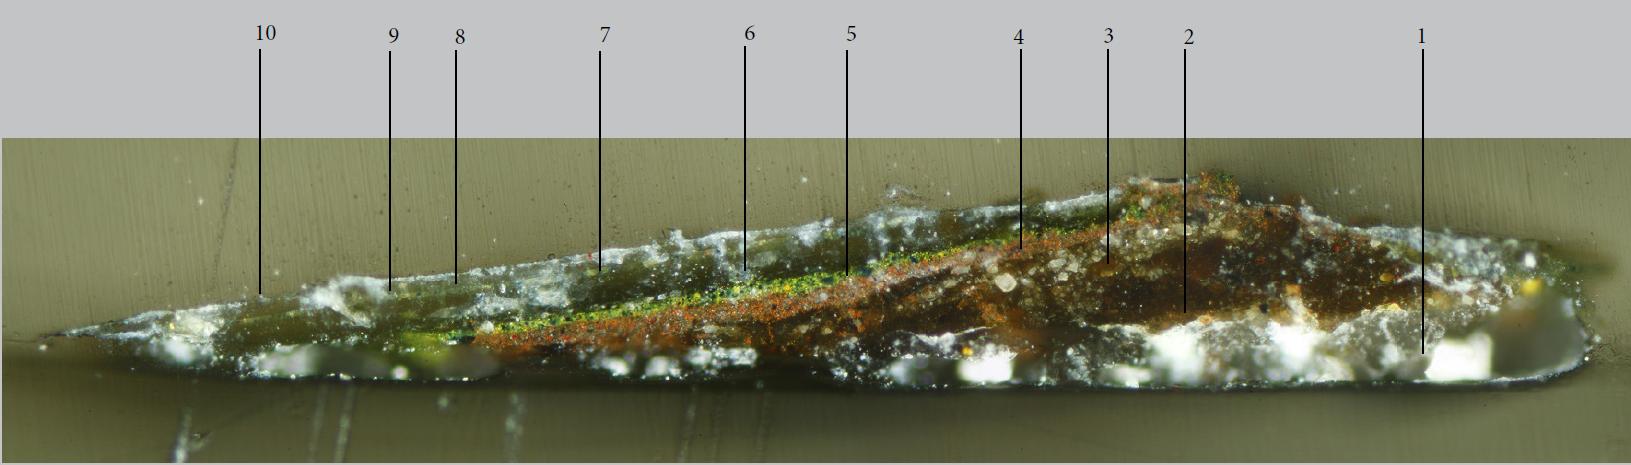 Fig. 7. Paint sample set in resin (cross section)(© Polkownik)